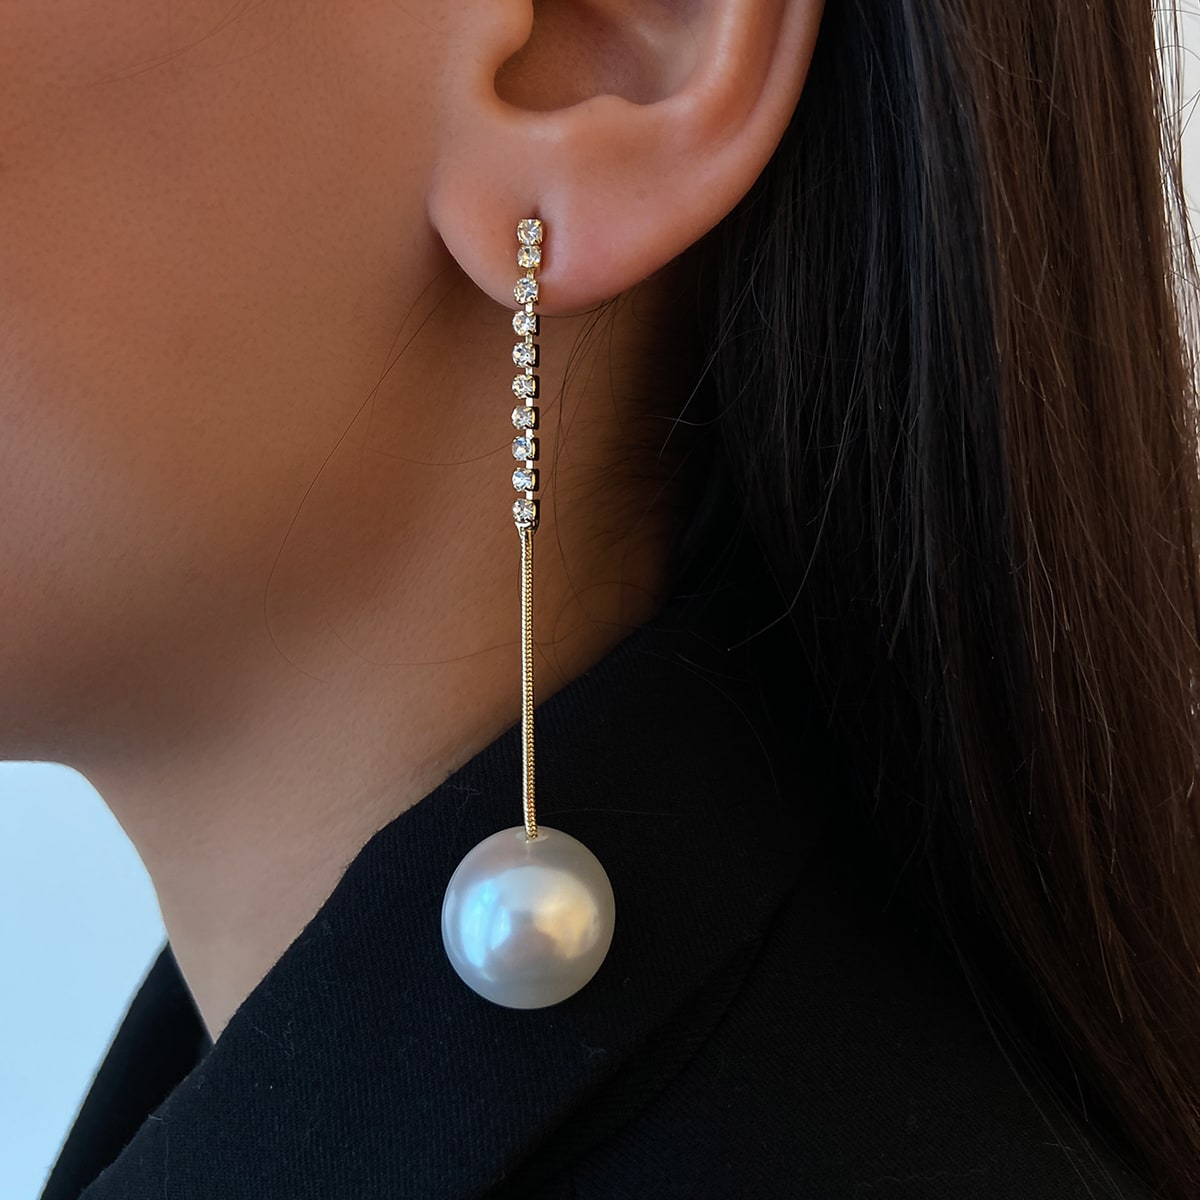 Rhinestone Decor Faux Pearl Drop Earrings, SHEIN  - buy with discount